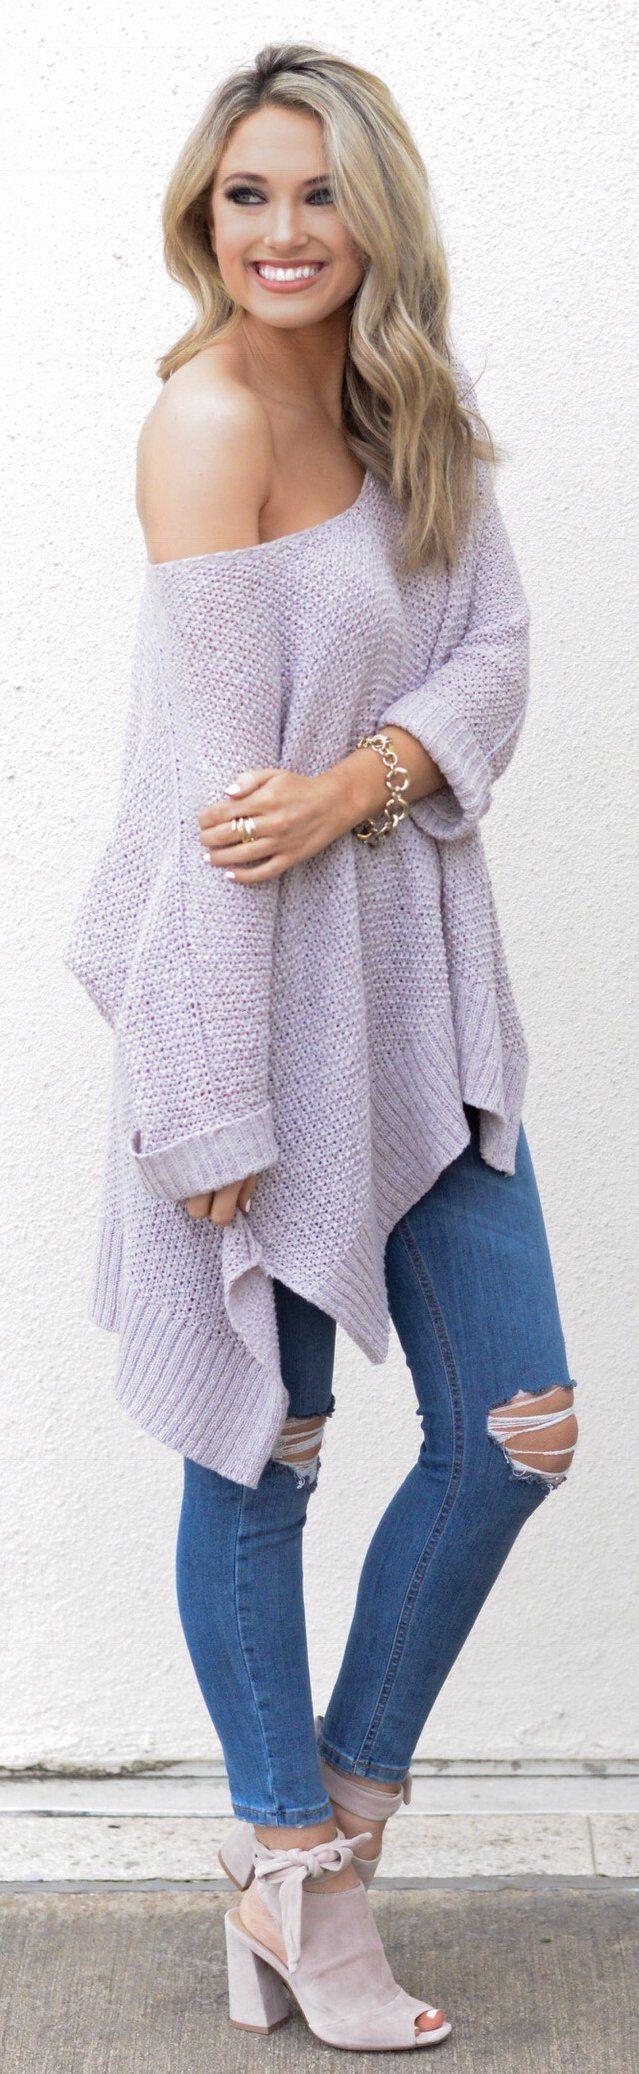 Light Purple Off Shoulder Knit / Ripped Skinny Jeans / Grey Open Toe Booties